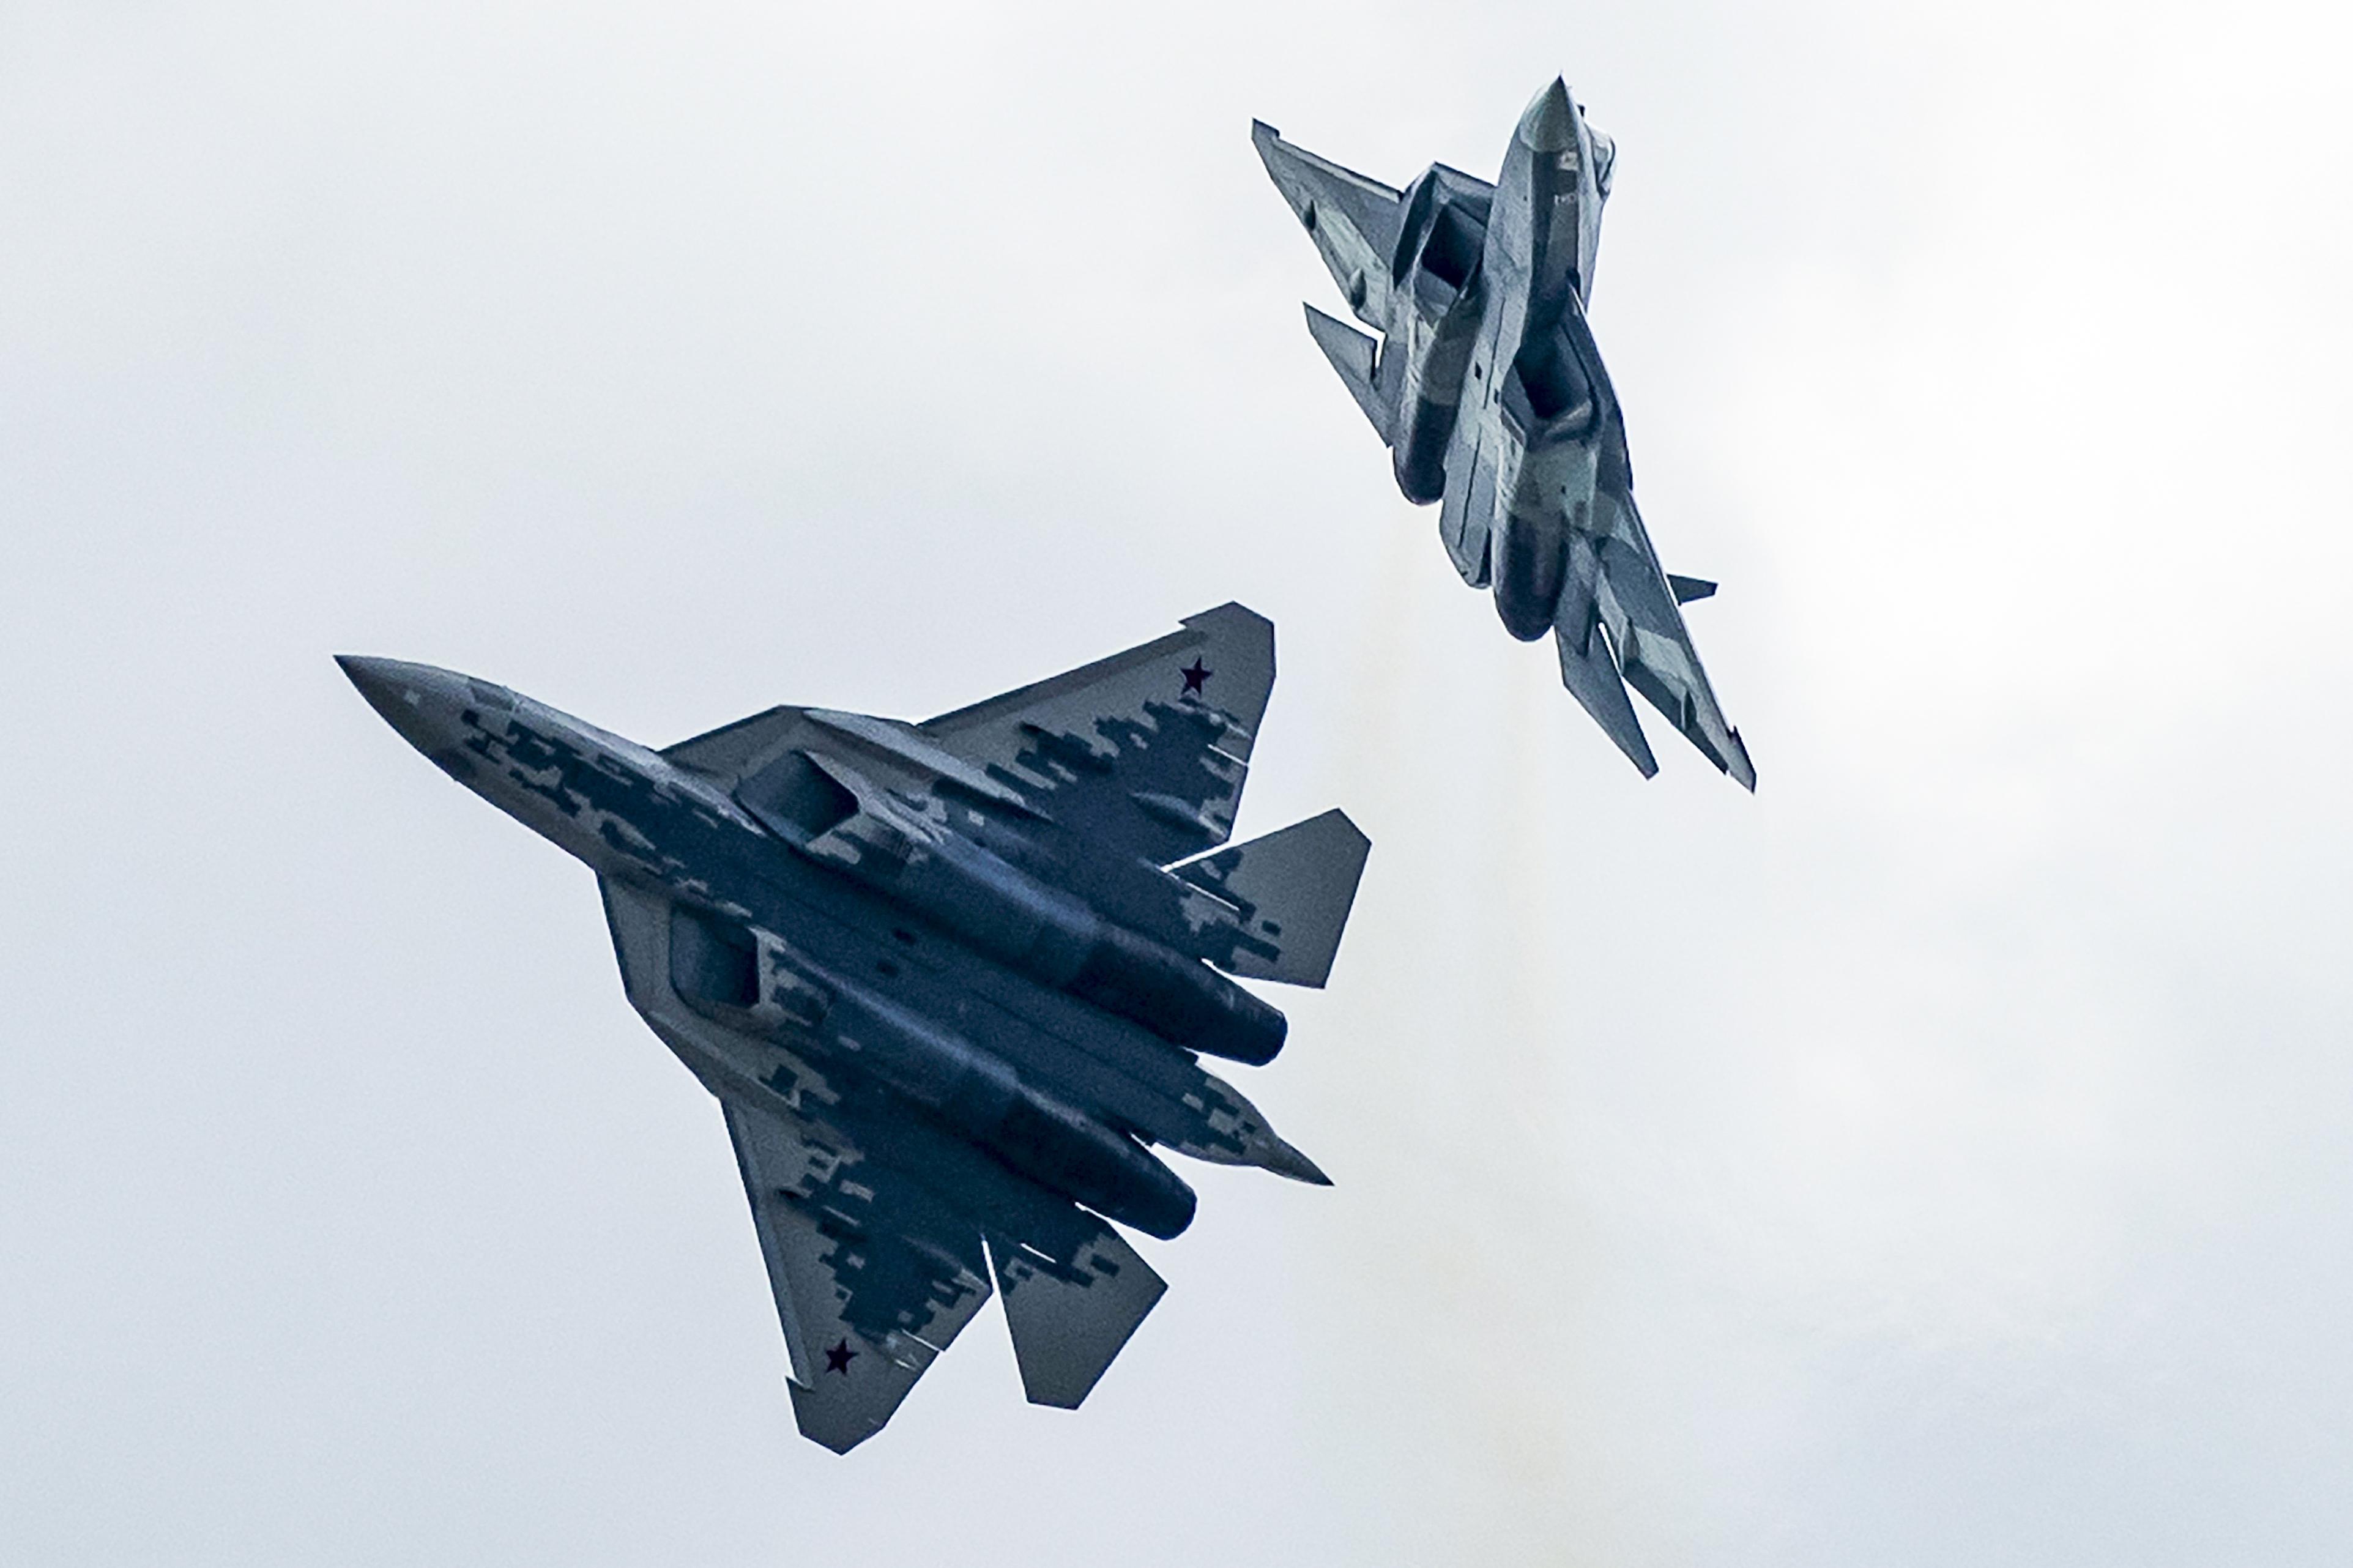 Russias most advanced fighter jet crashes, pilot survives